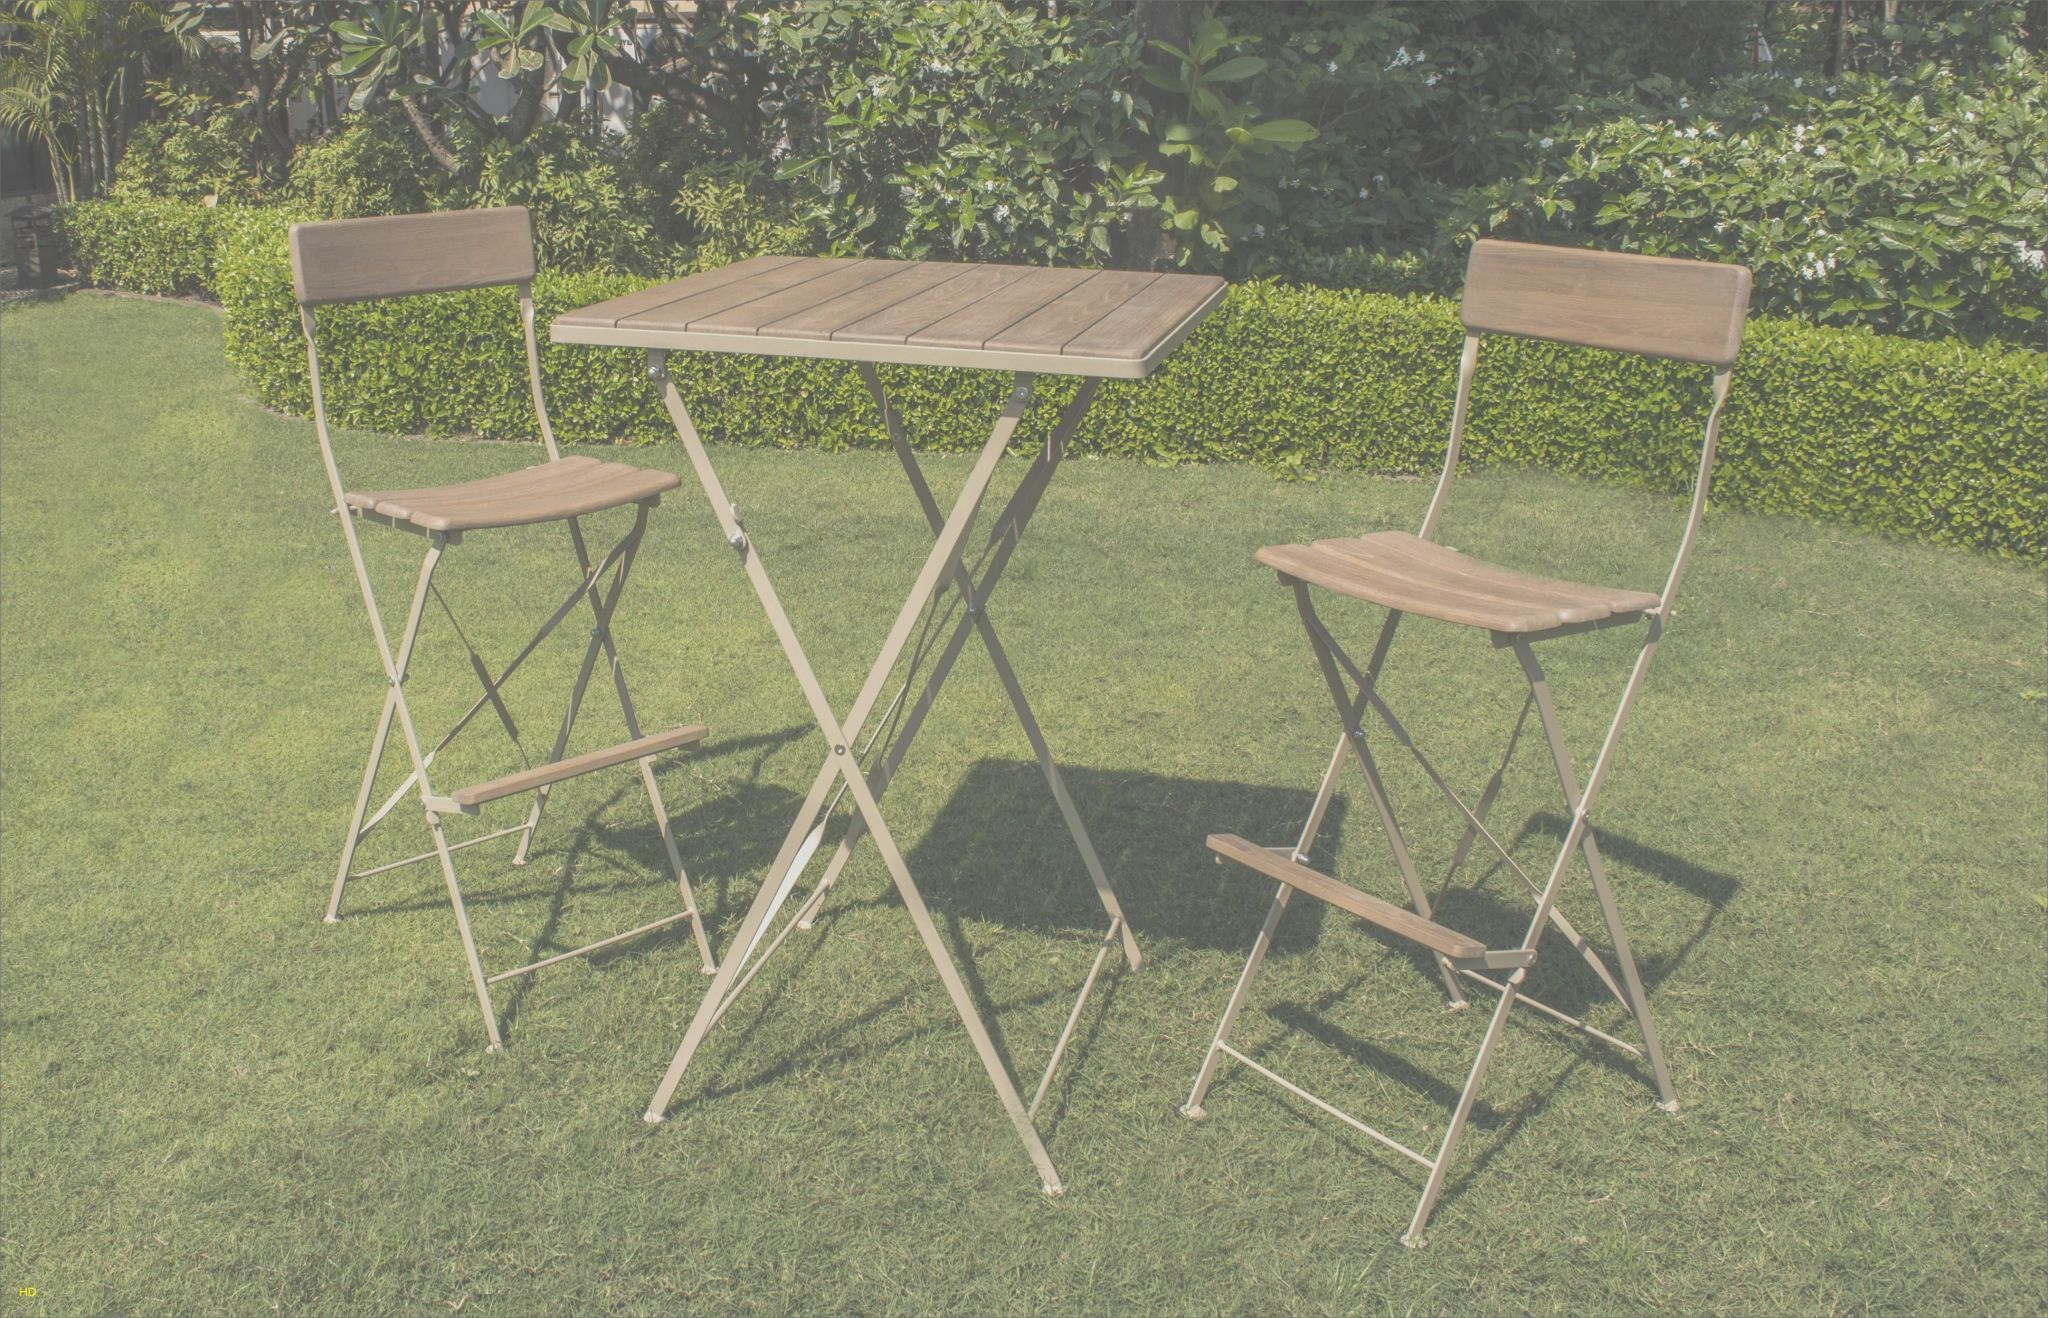 Pin On Conception De Jardin concernant Table De Jardin Plastique Leclerc